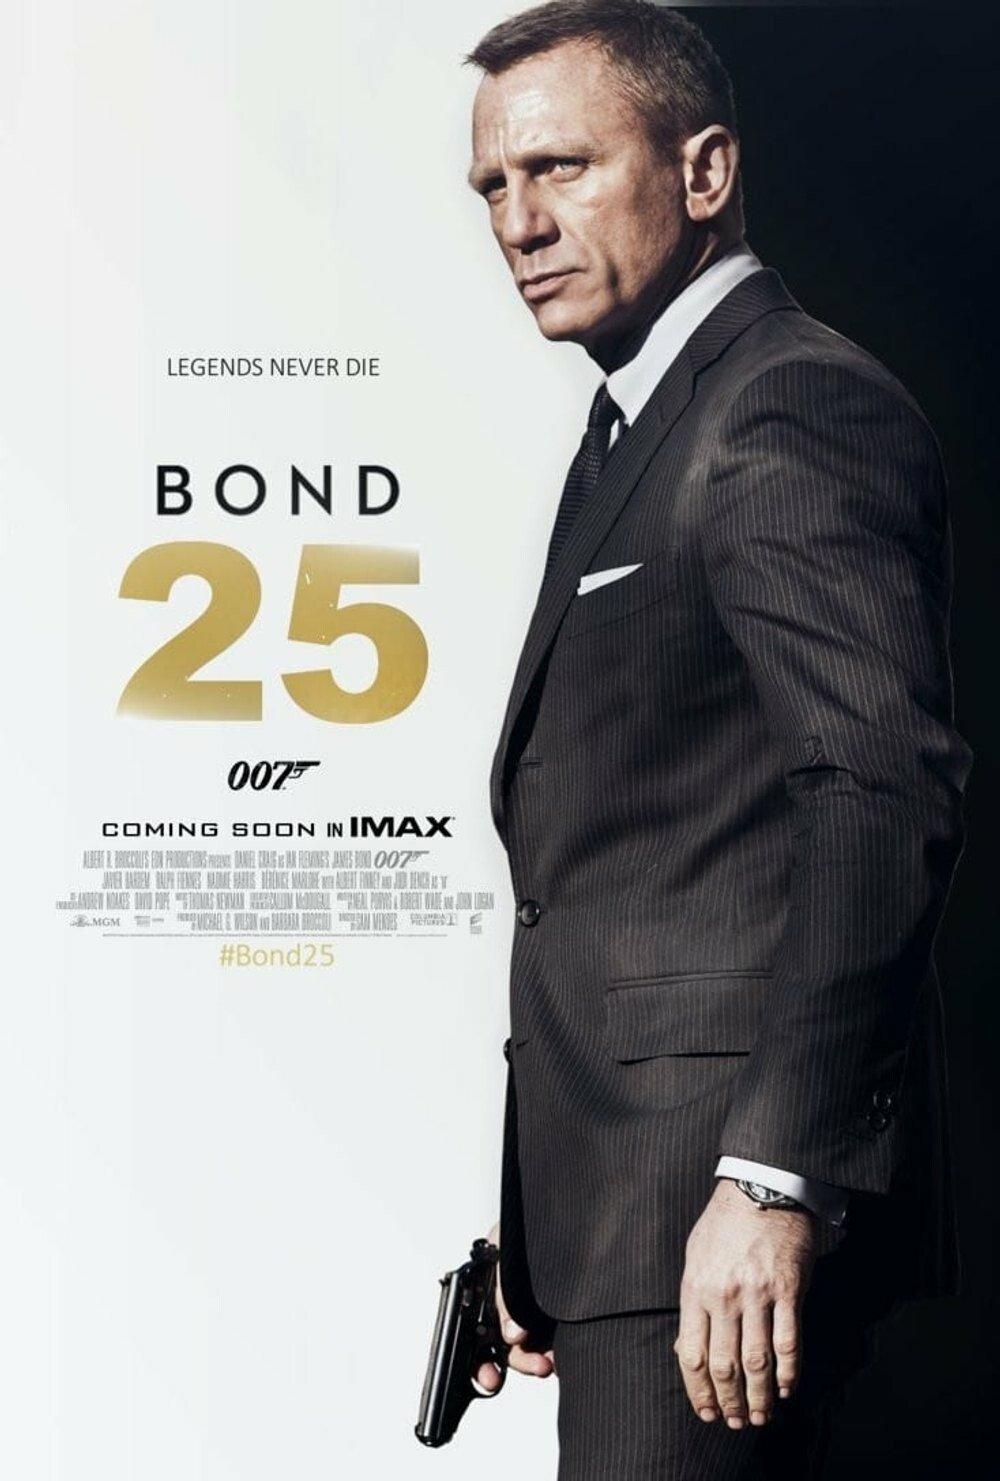 James-Bond-25.jpg 19년 개봉예정영화 미친라인업